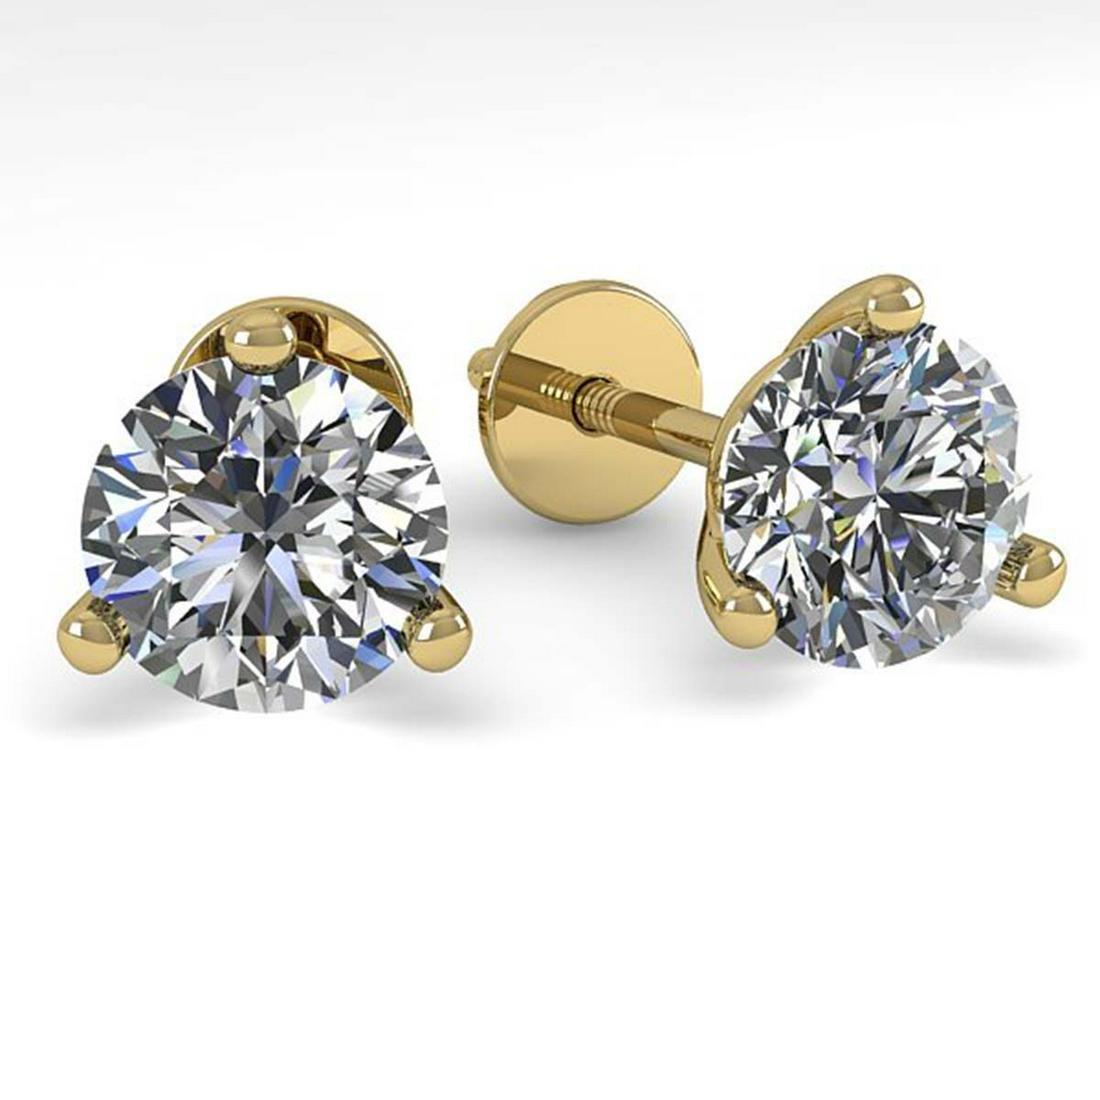 1.01 ctw VS/SI Diamond Stud Earrings 14K Yellow Gold -